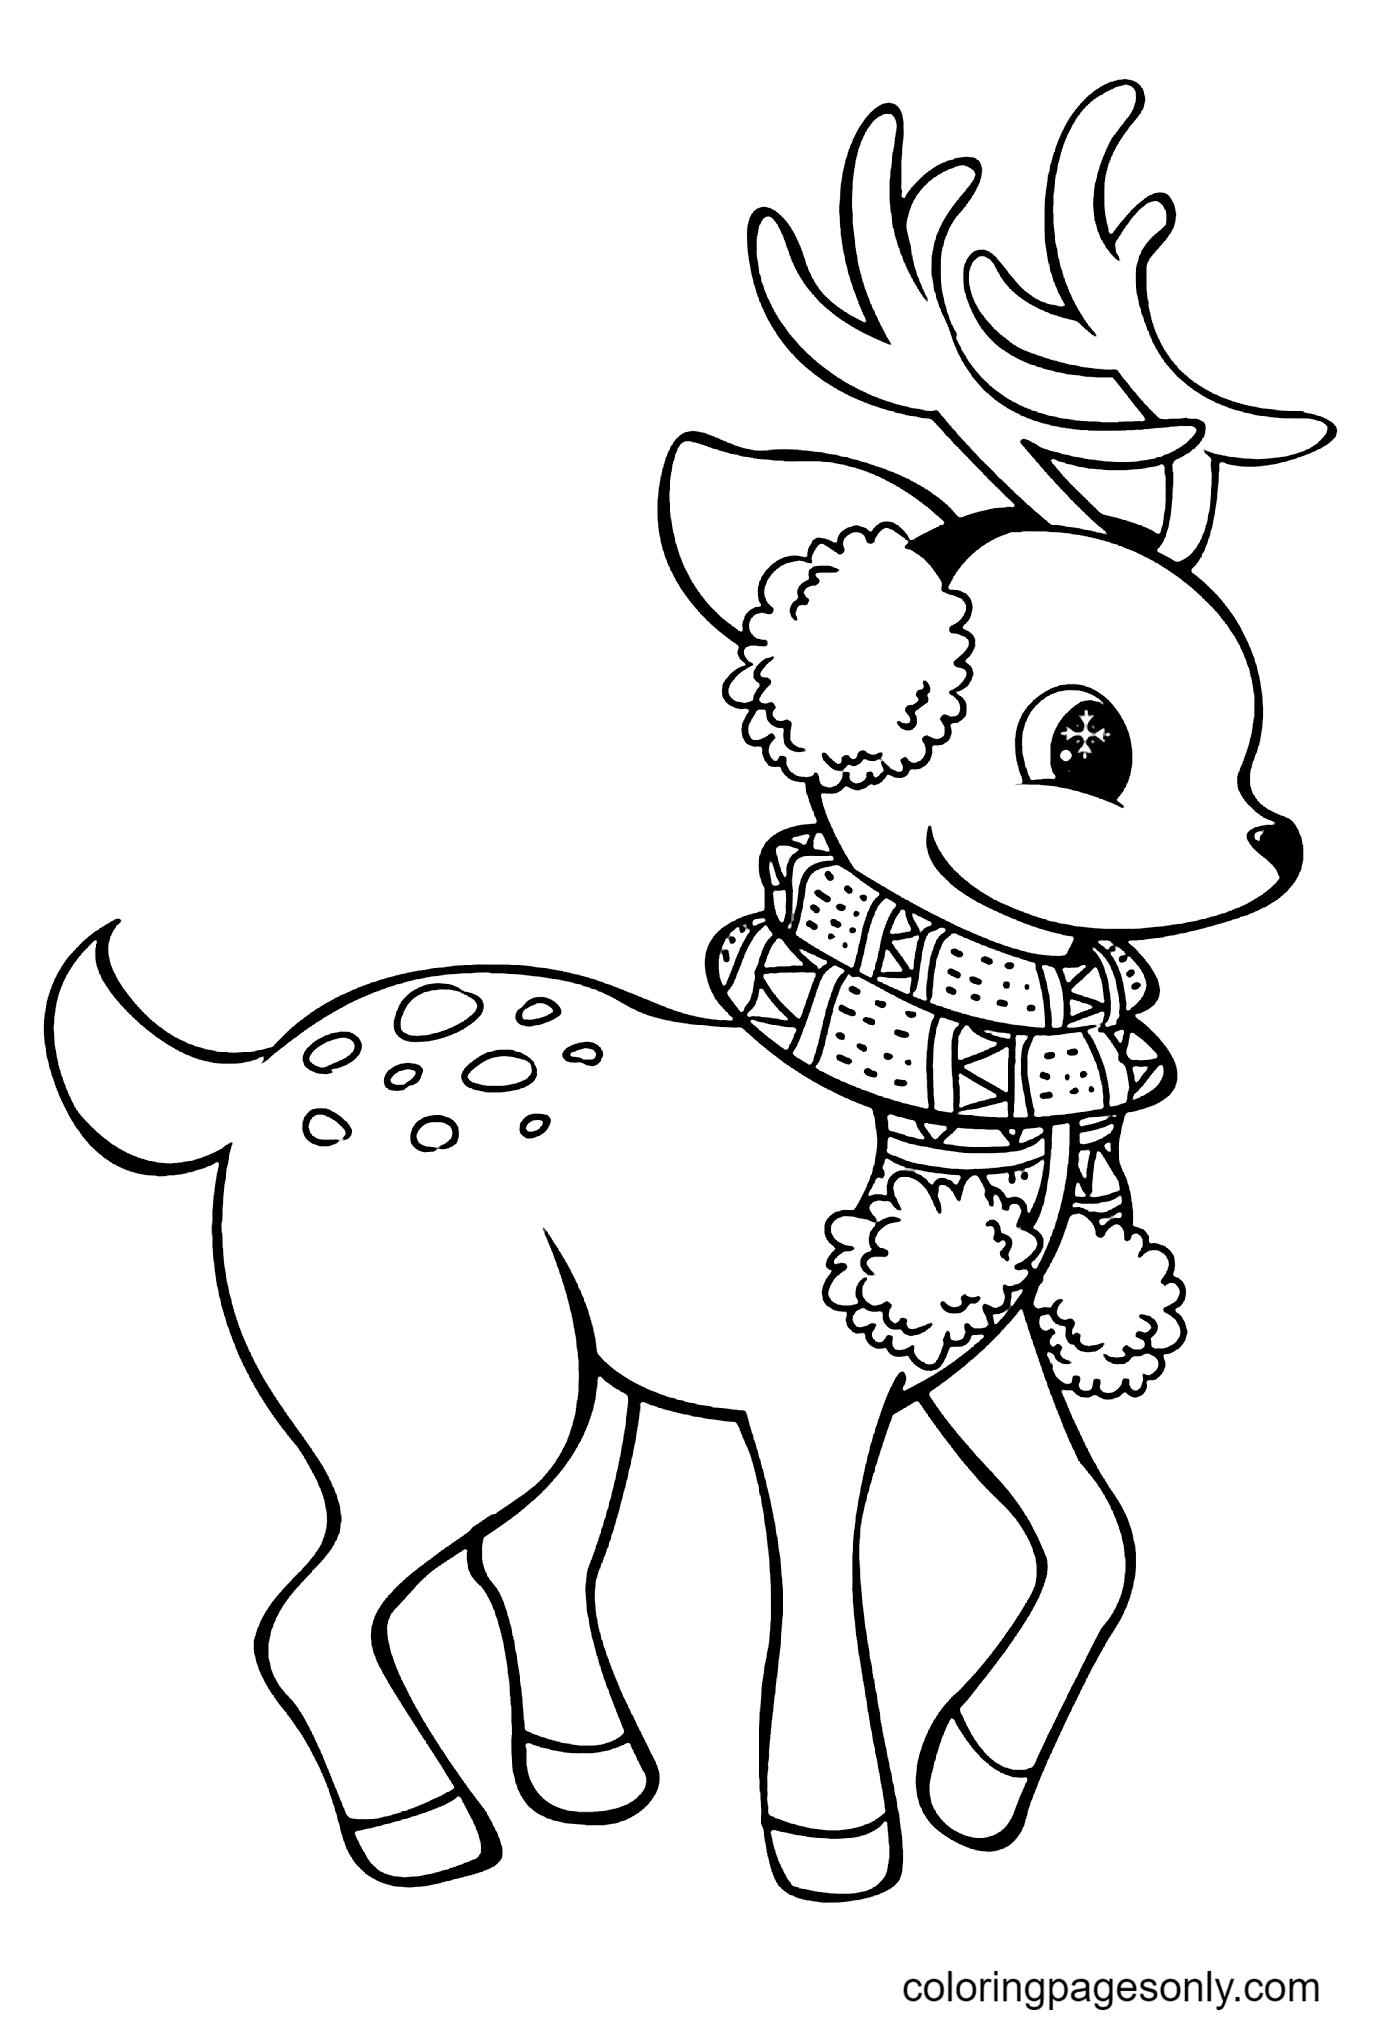 Warm Baby Reindeer Coloring Page